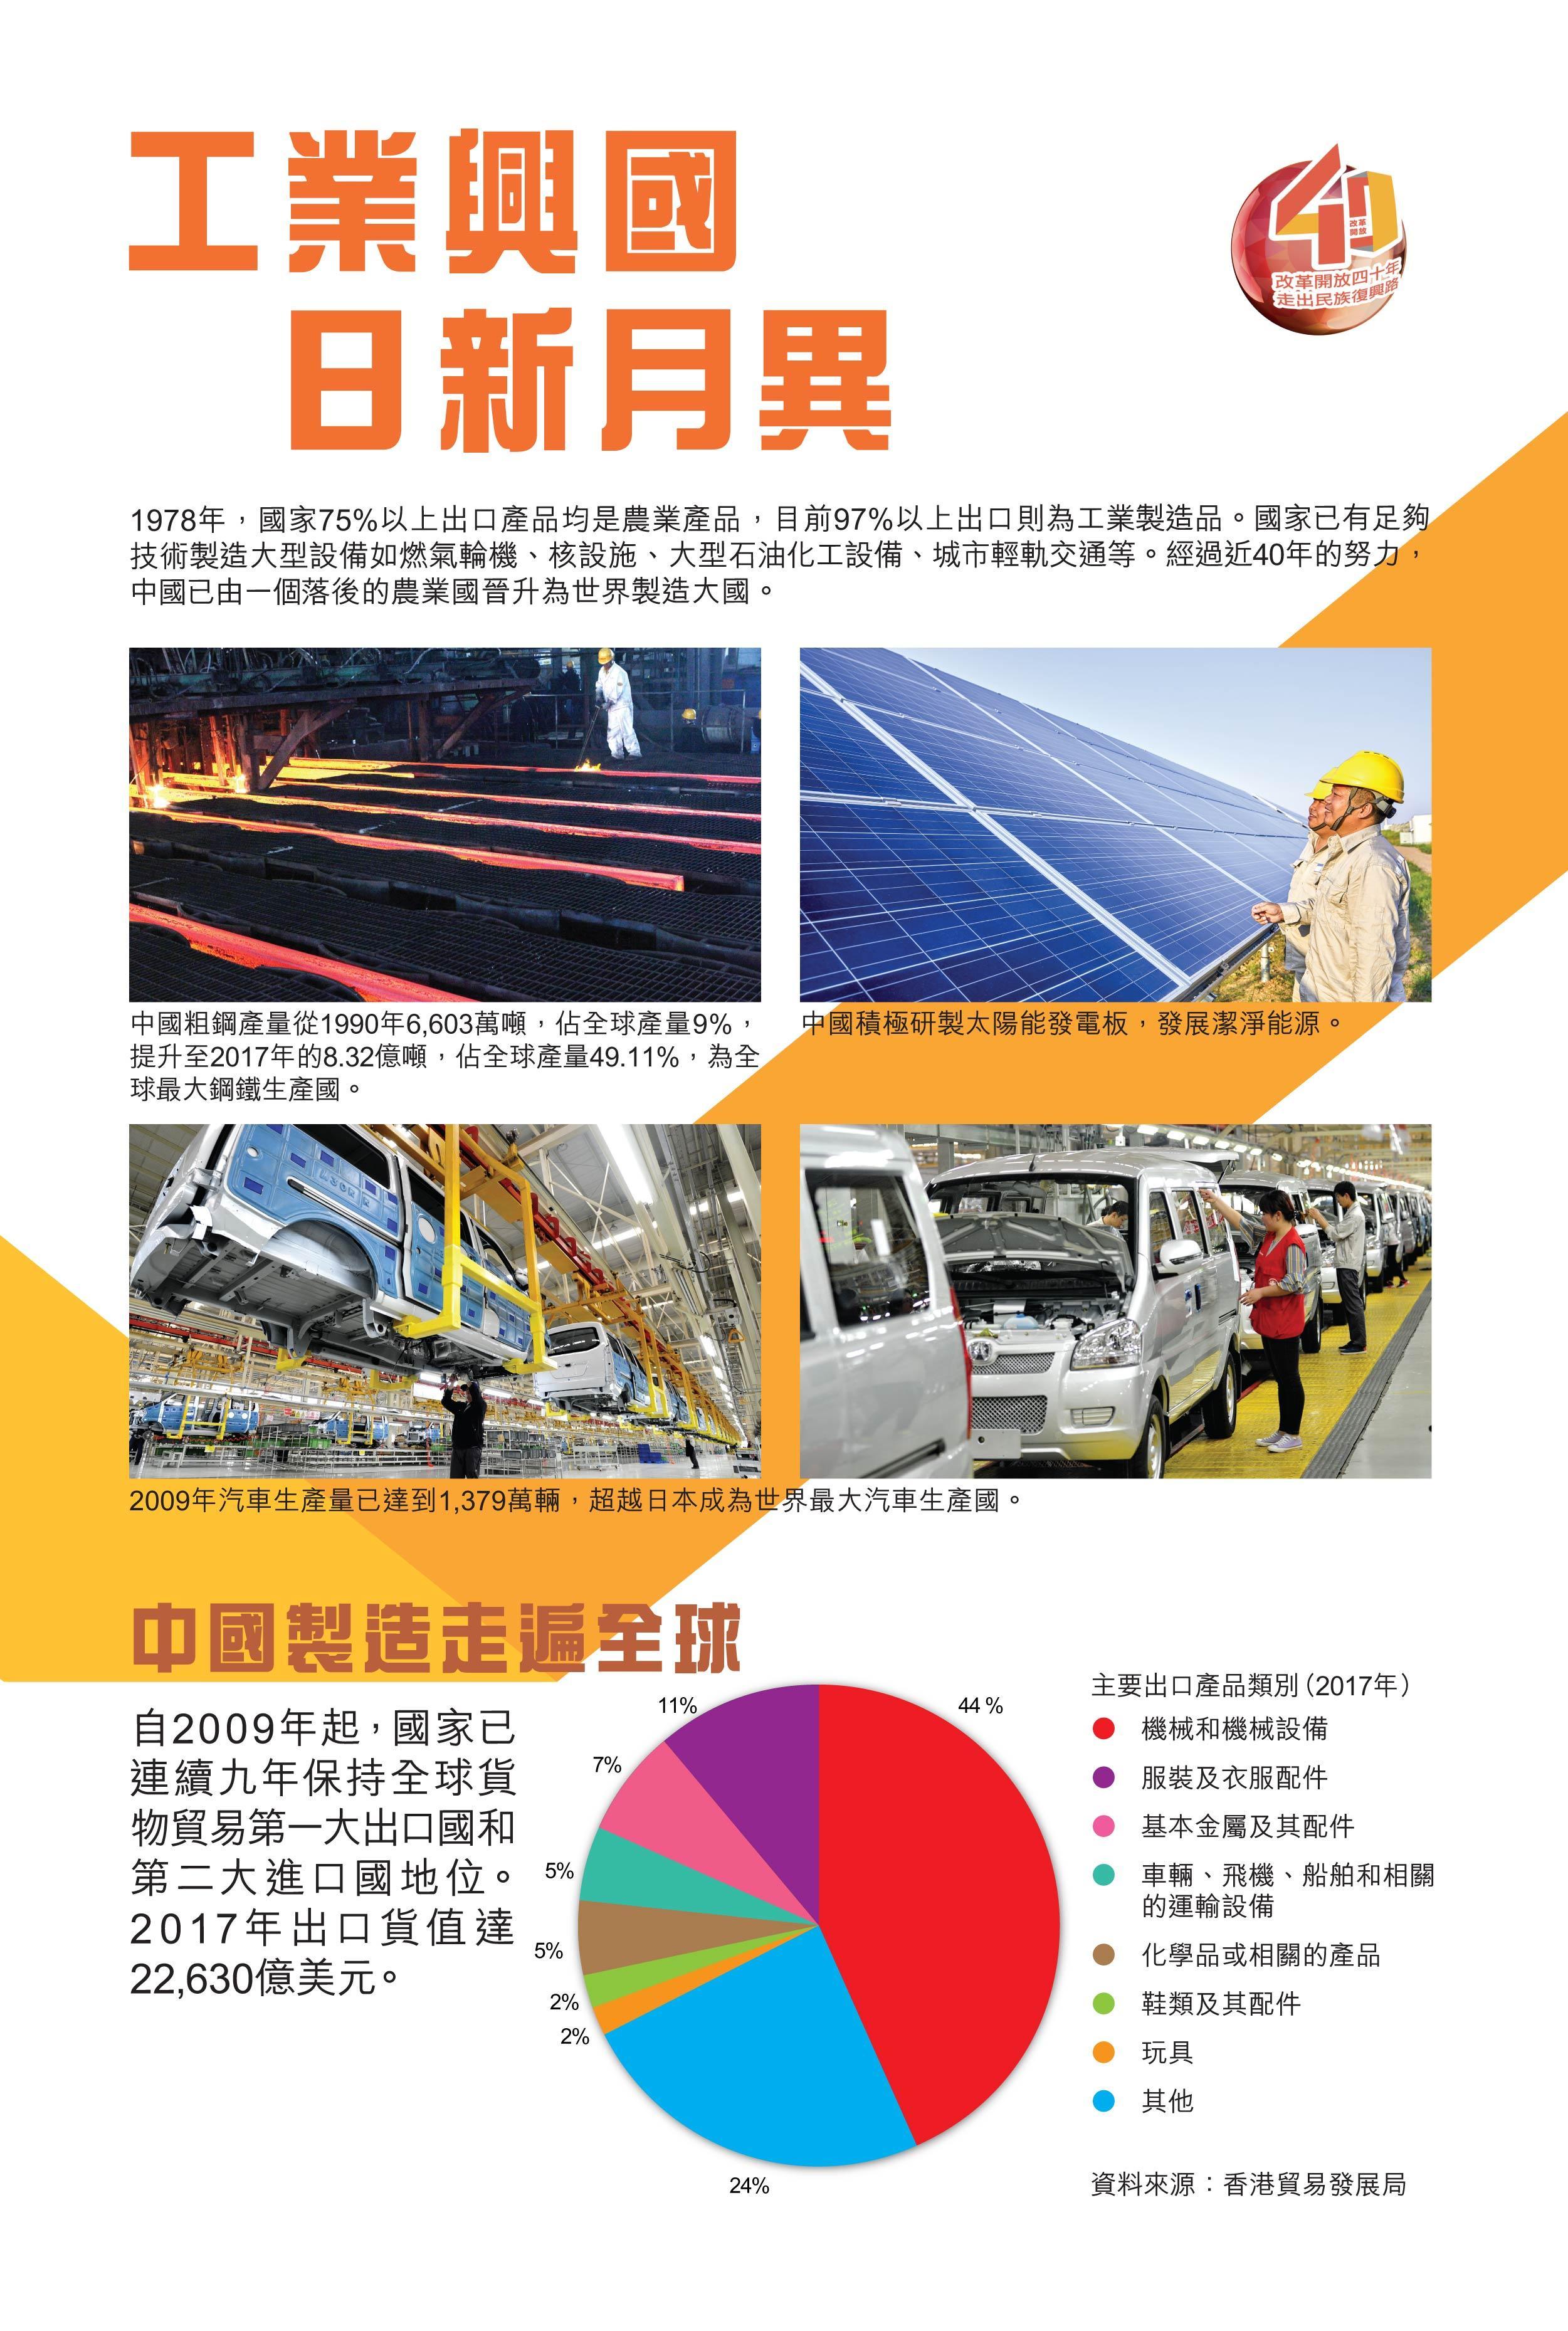 innotech_40anni_hk-cn-layout_zhanbansi_aw_oct29_websize_gongyexingguorixinyueyi